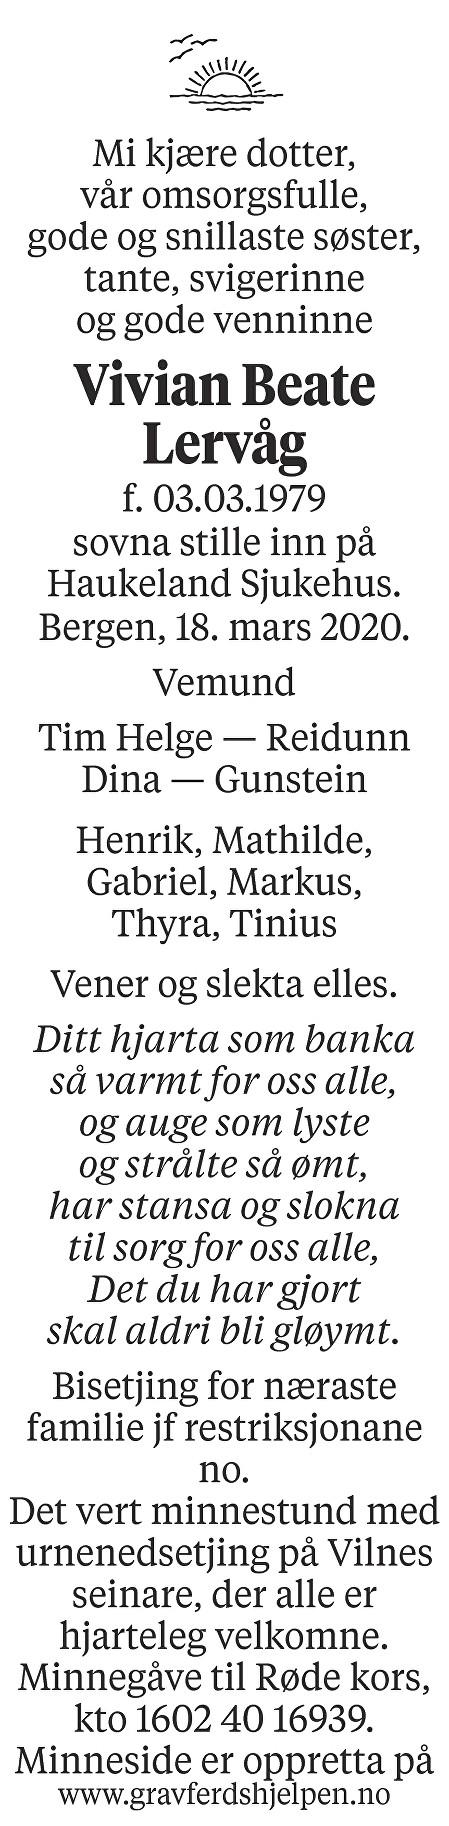 Vivian Beate Lervåg Dødsannonse